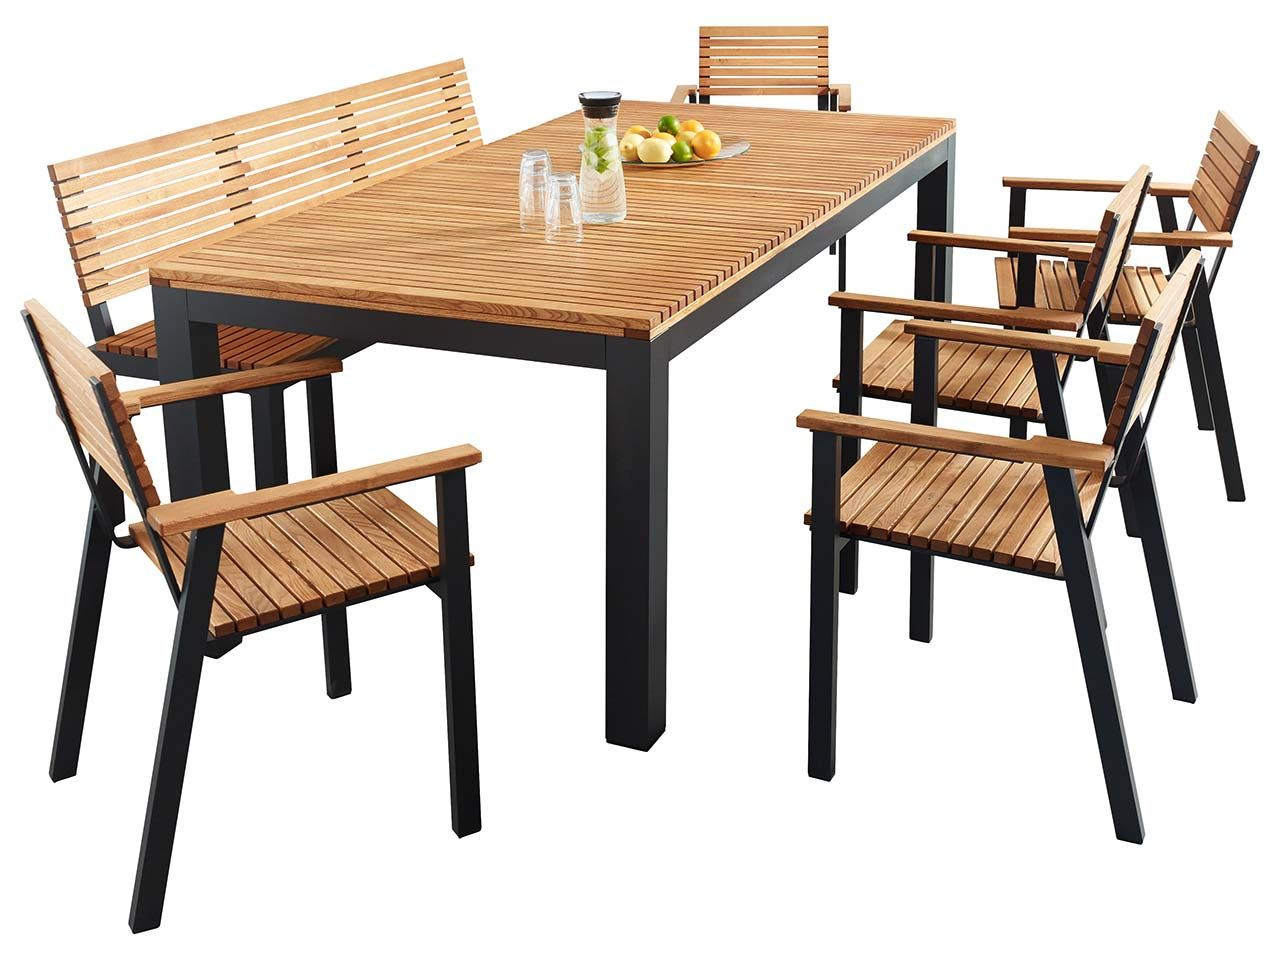 Gartenmobel Set Sassa 7 Teilig 5 Sessel 1 Bank 1 Tisch 200 X 100 Cm Gartenmobel Sets Gartenmobel Aussenmobel